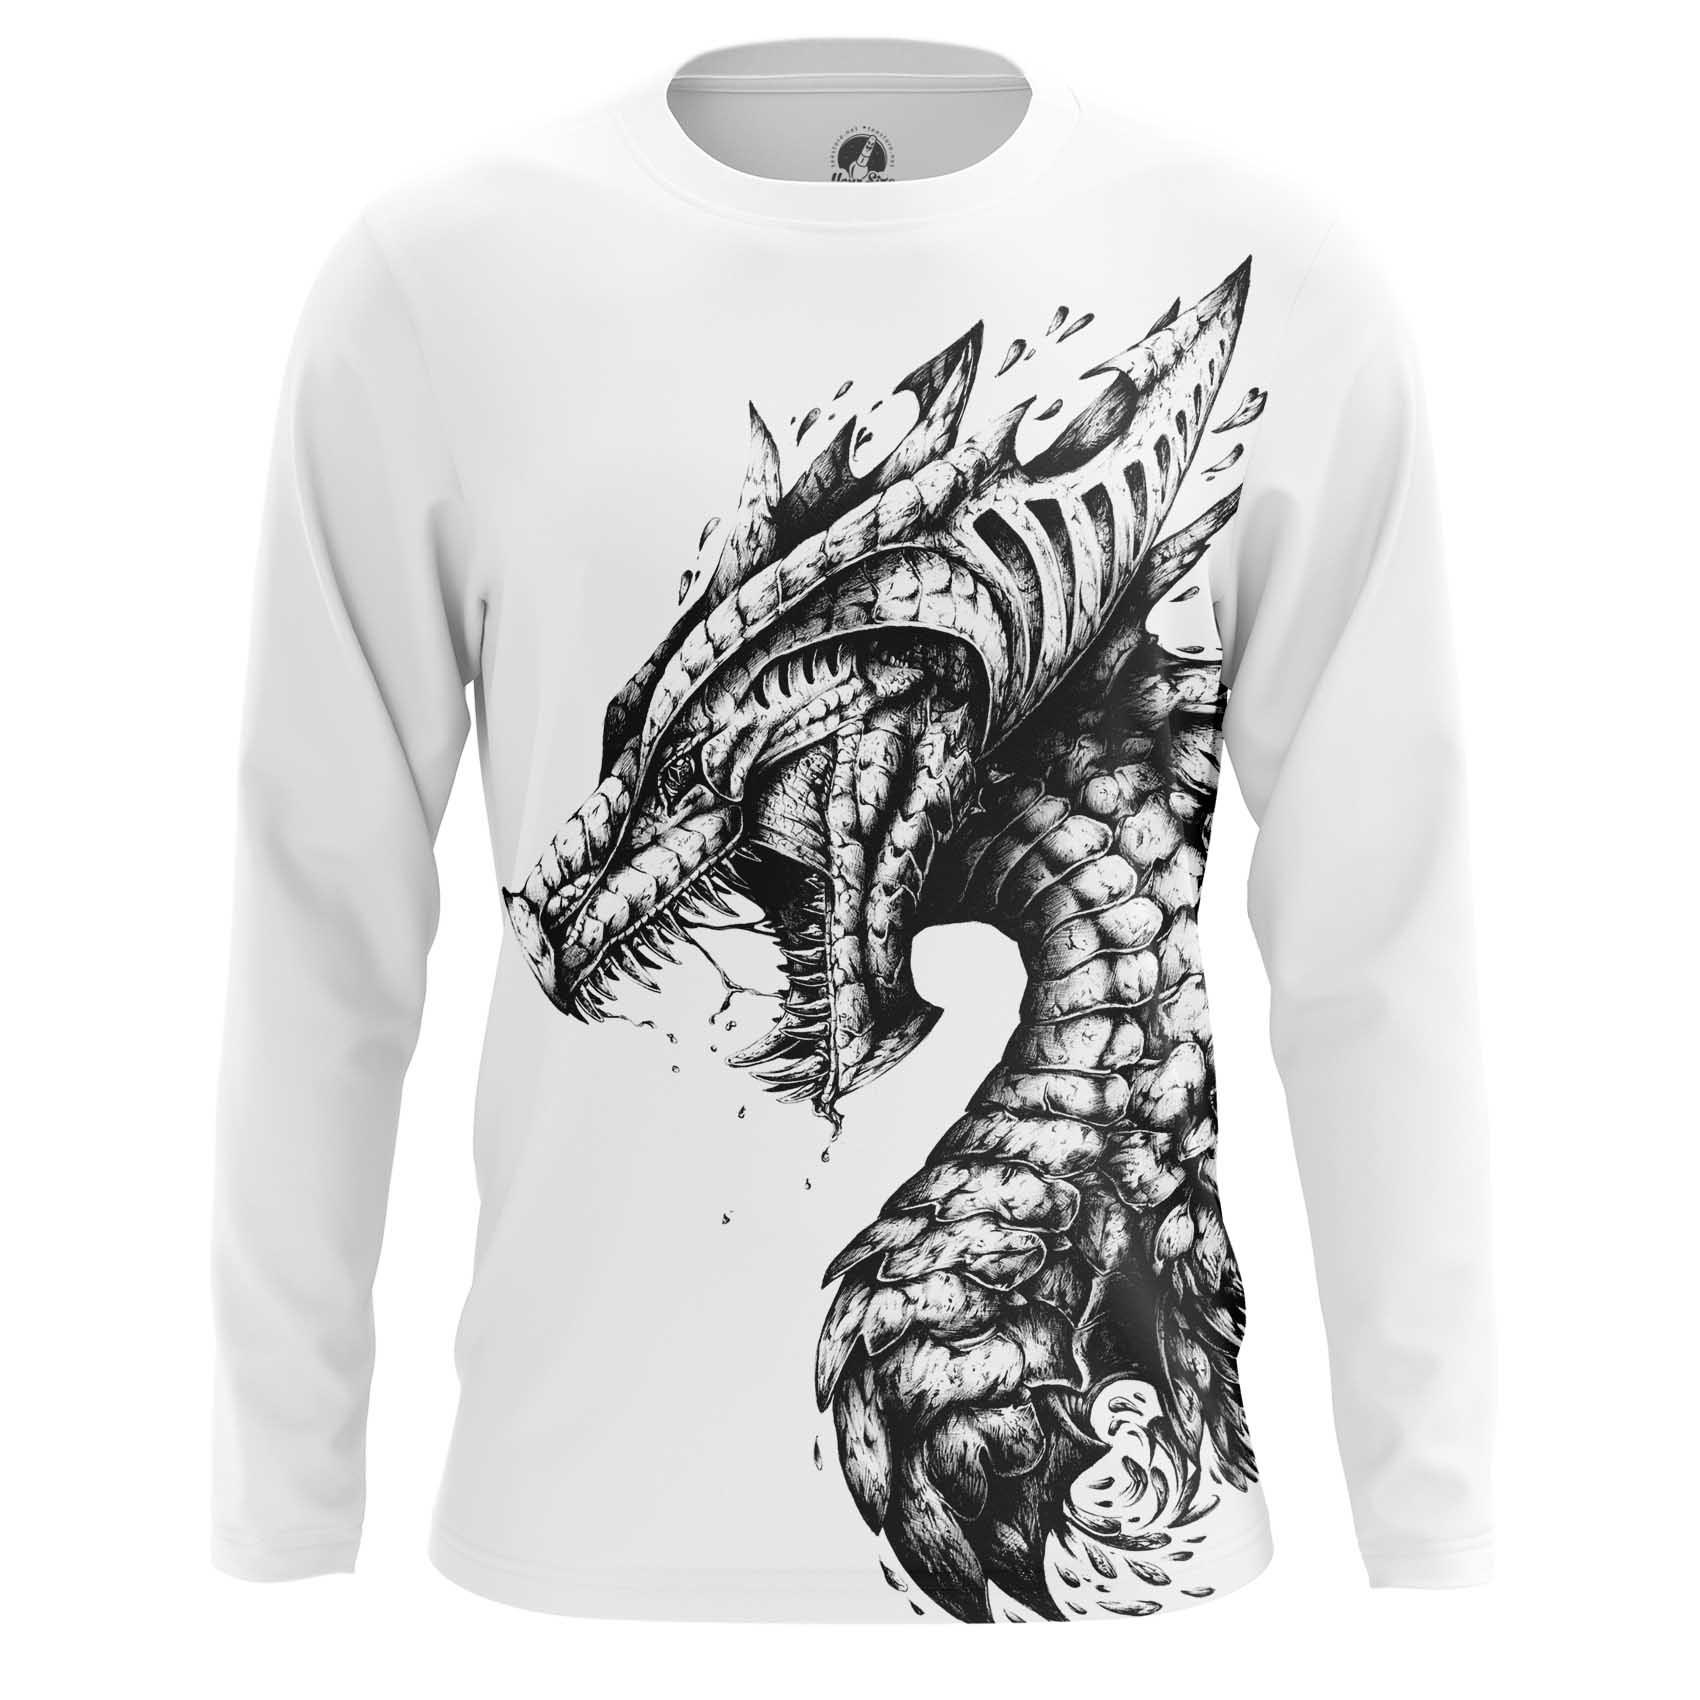 Merchandise Long Sleeve Dragon Monster Giant Reptile